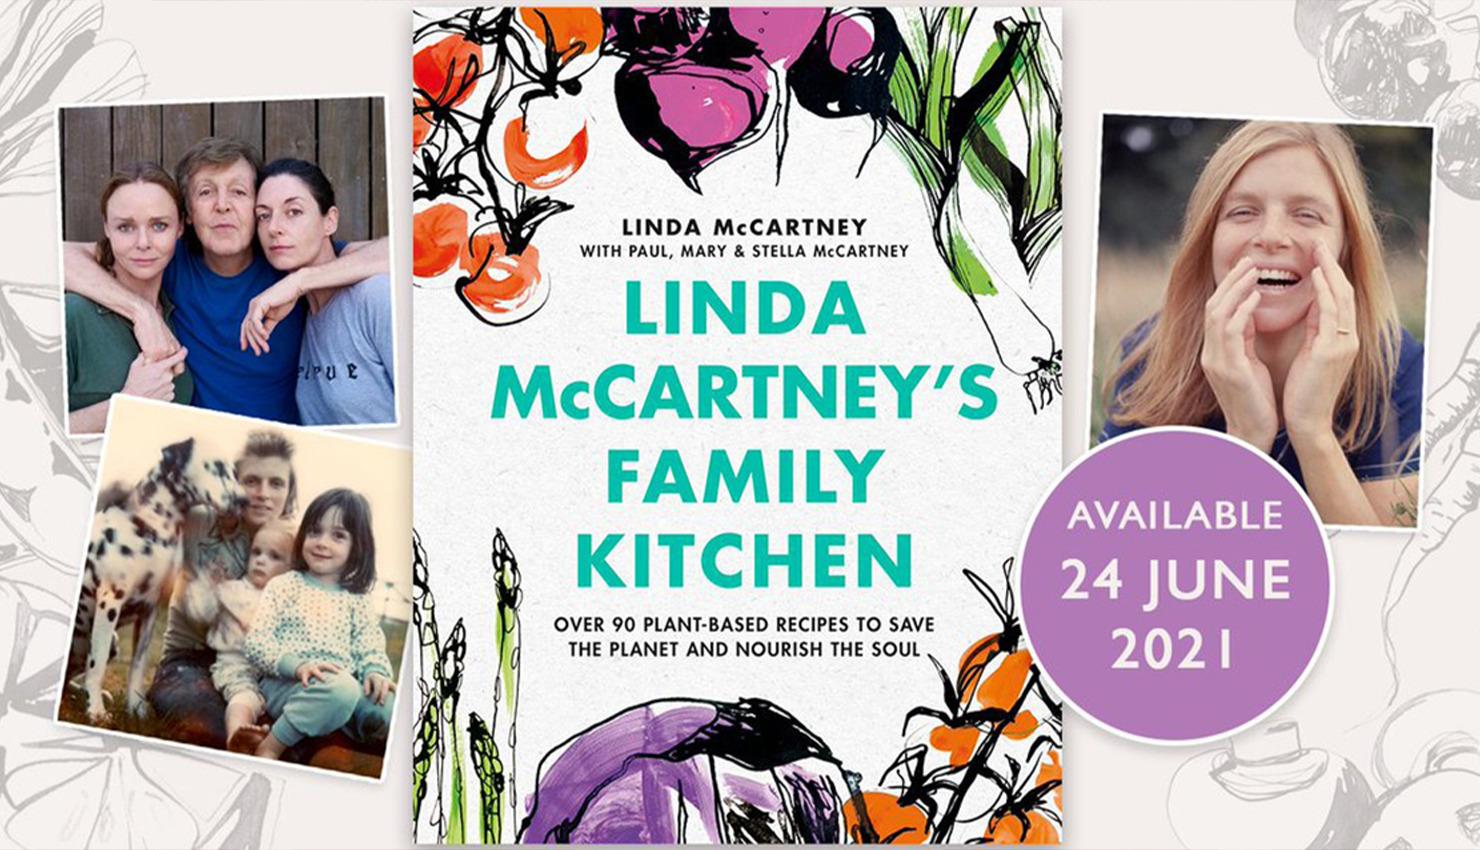 linda-mccartney-libros-verano-novedades-editoriales-magazinehorse